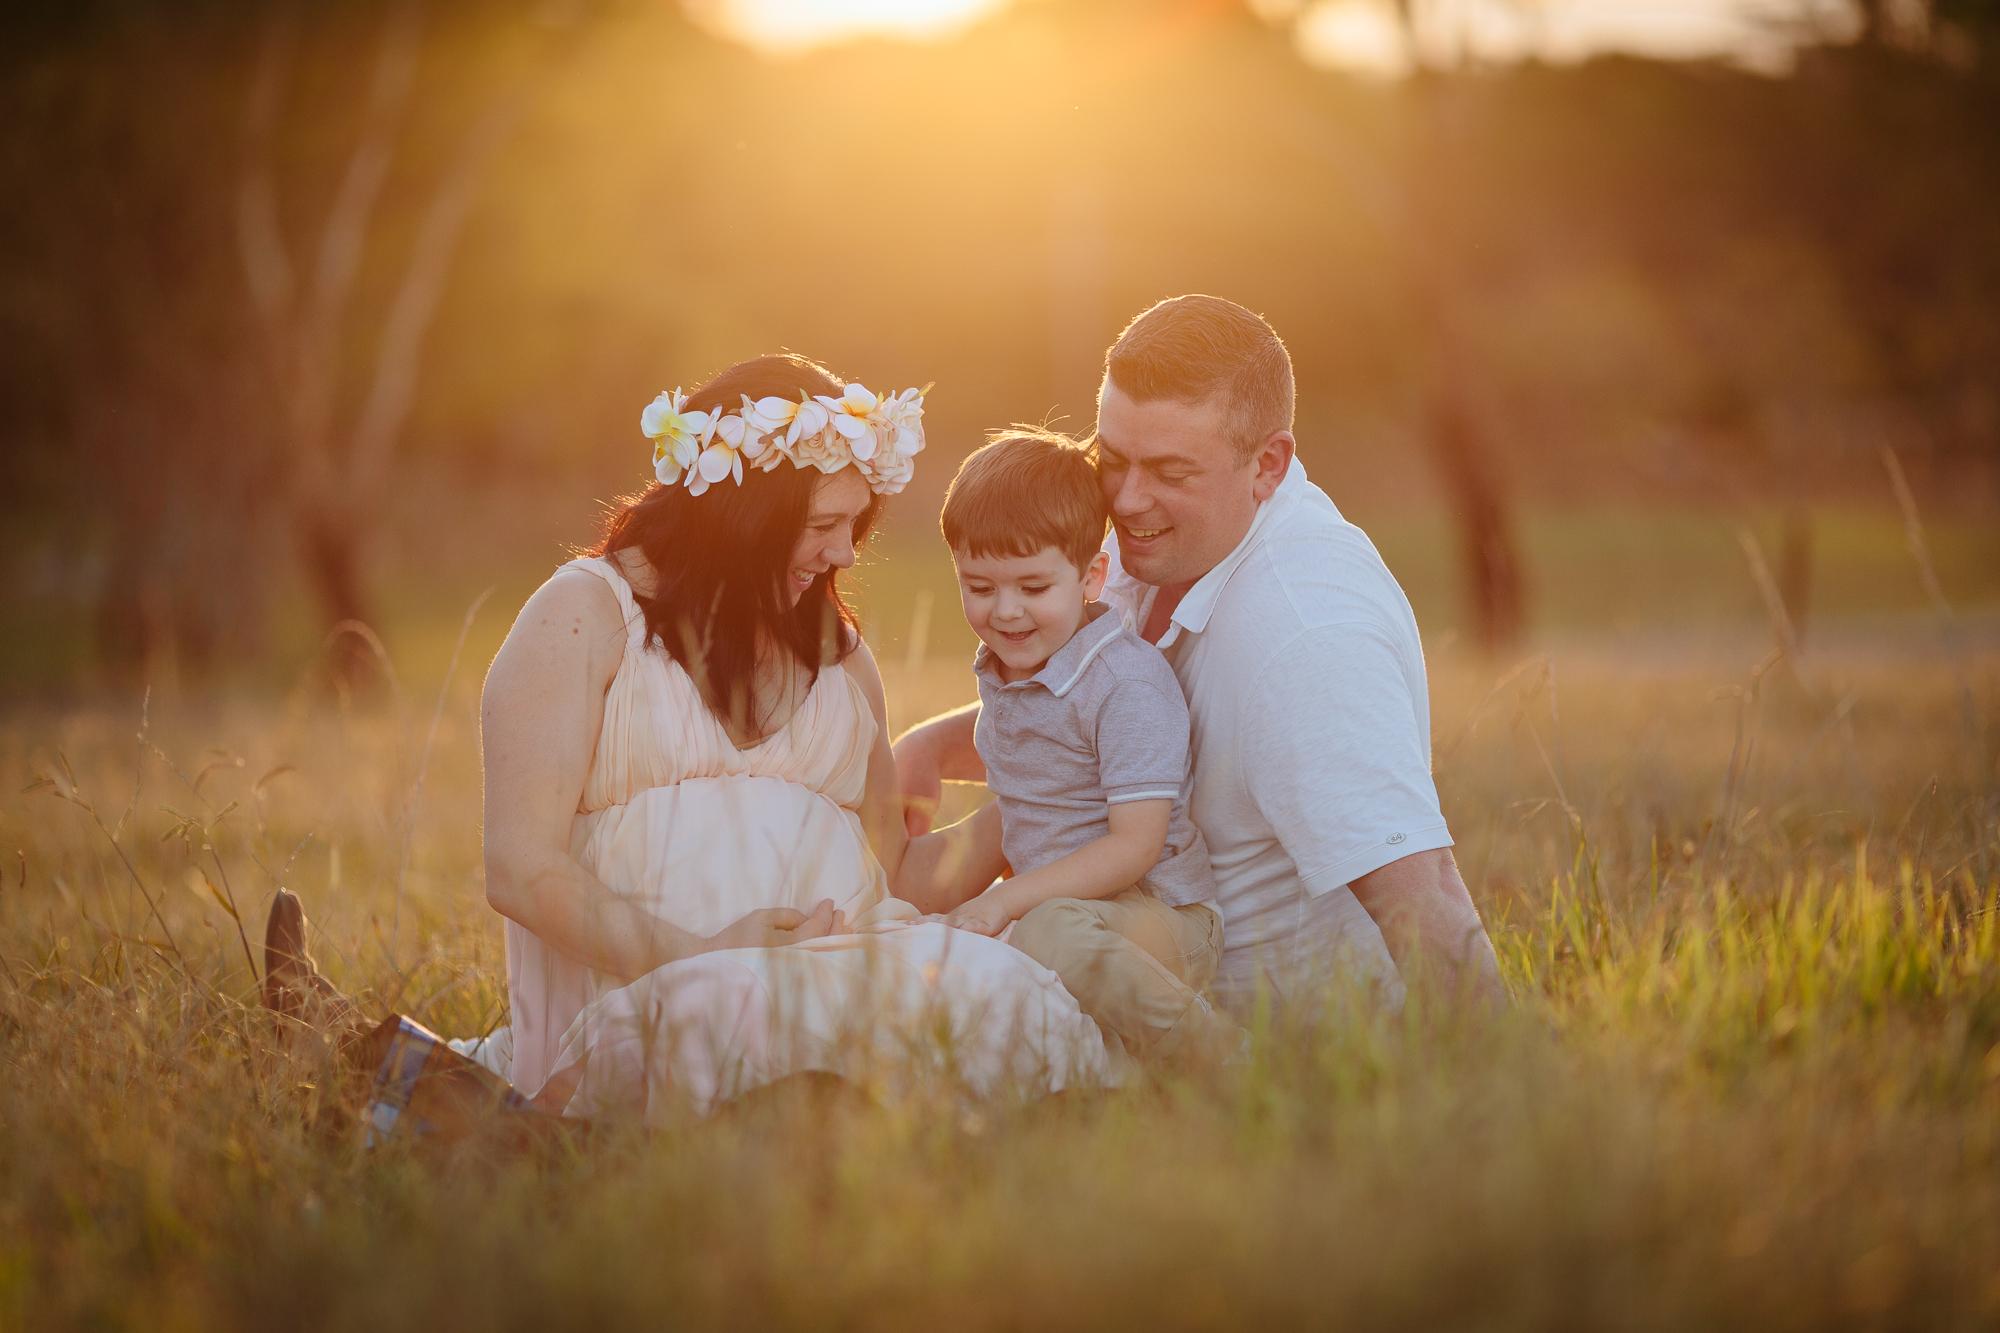 104_Maternity Lifetsyle_Shelley_Sunlight Photography.JPG